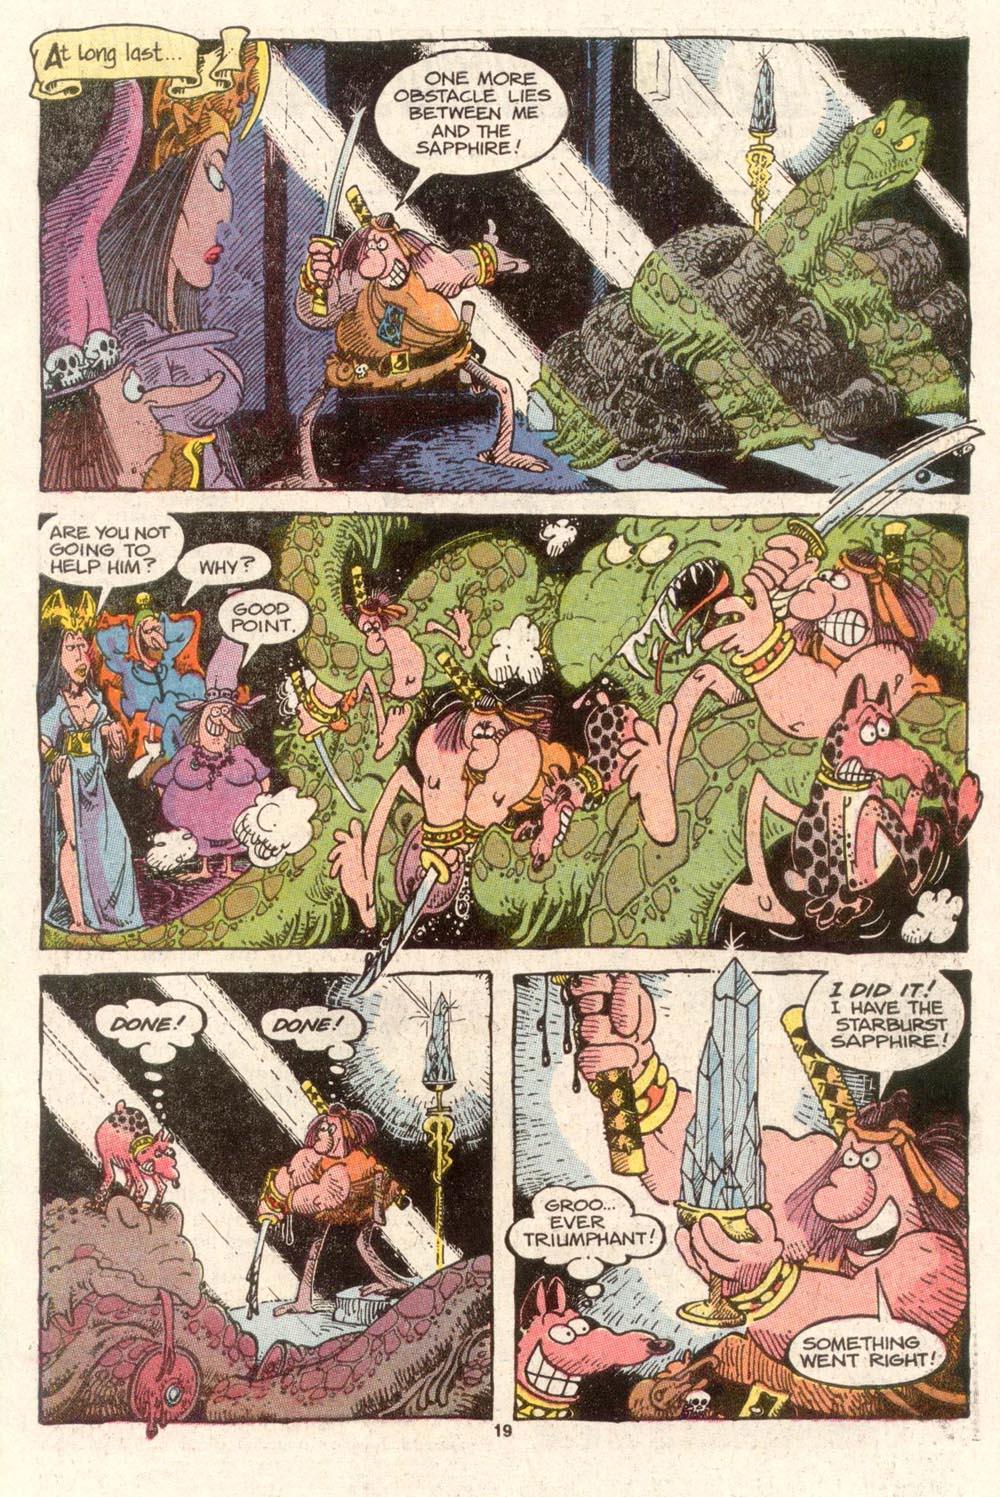 Read online Sergio Aragonés Groo the Wanderer comic -  Issue #47 - 19